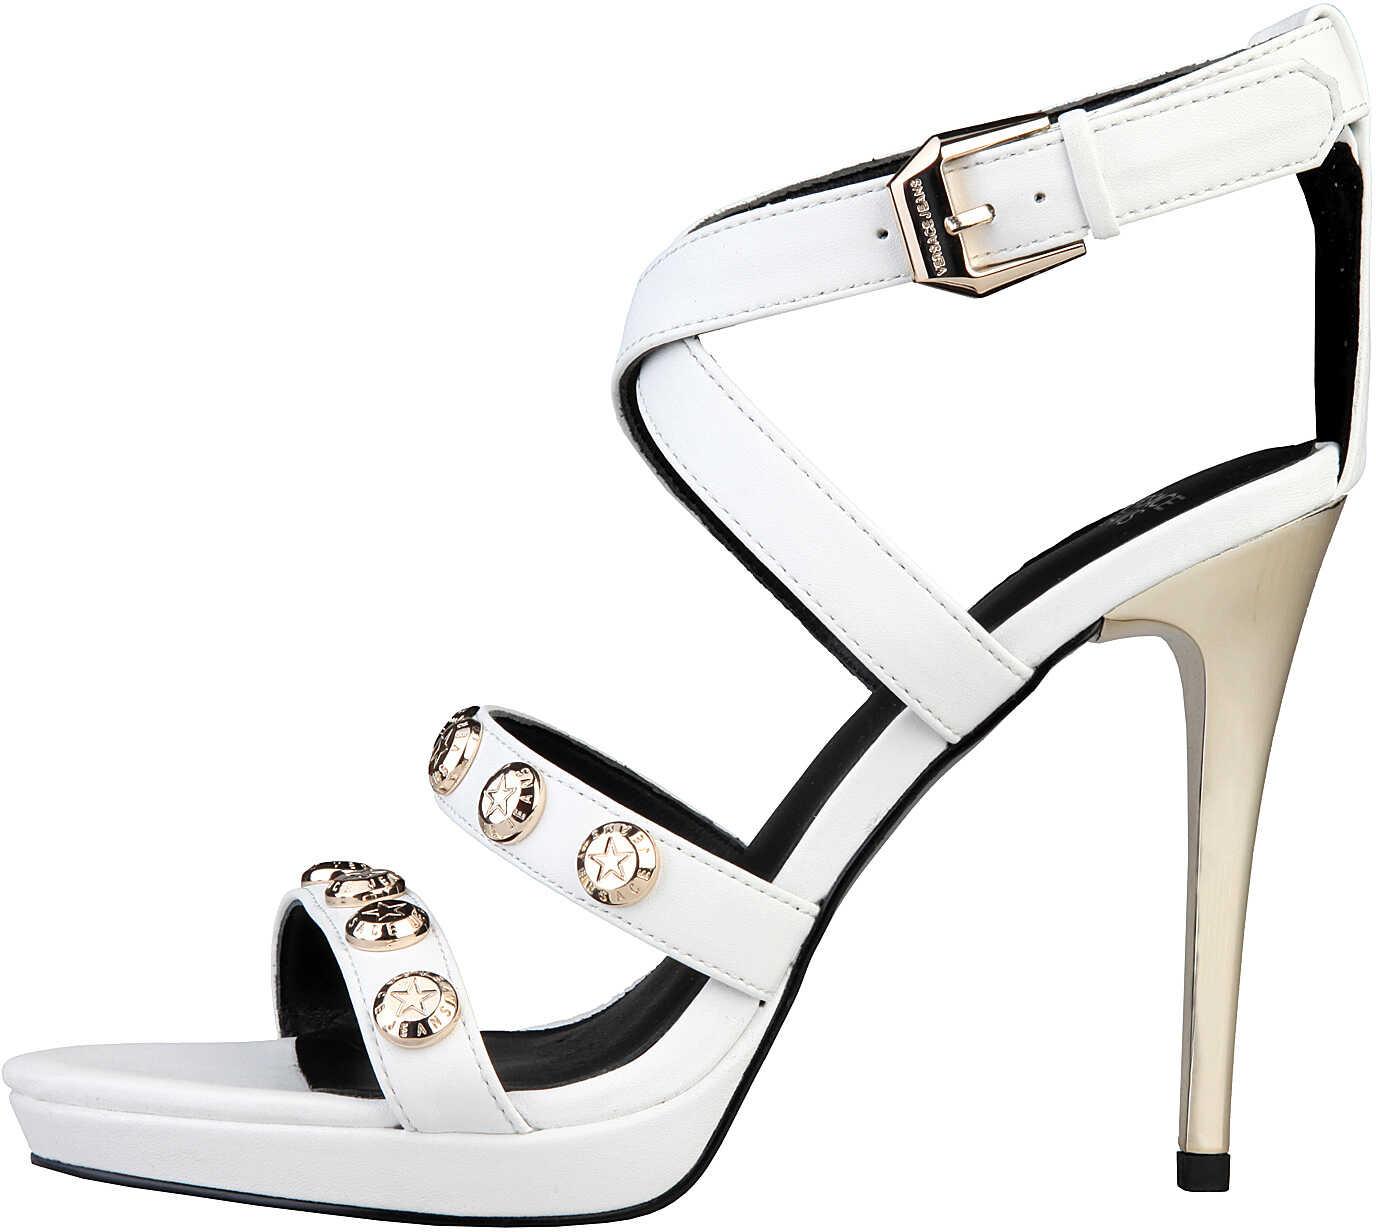 Versace Jeans E0Vlbs01 White